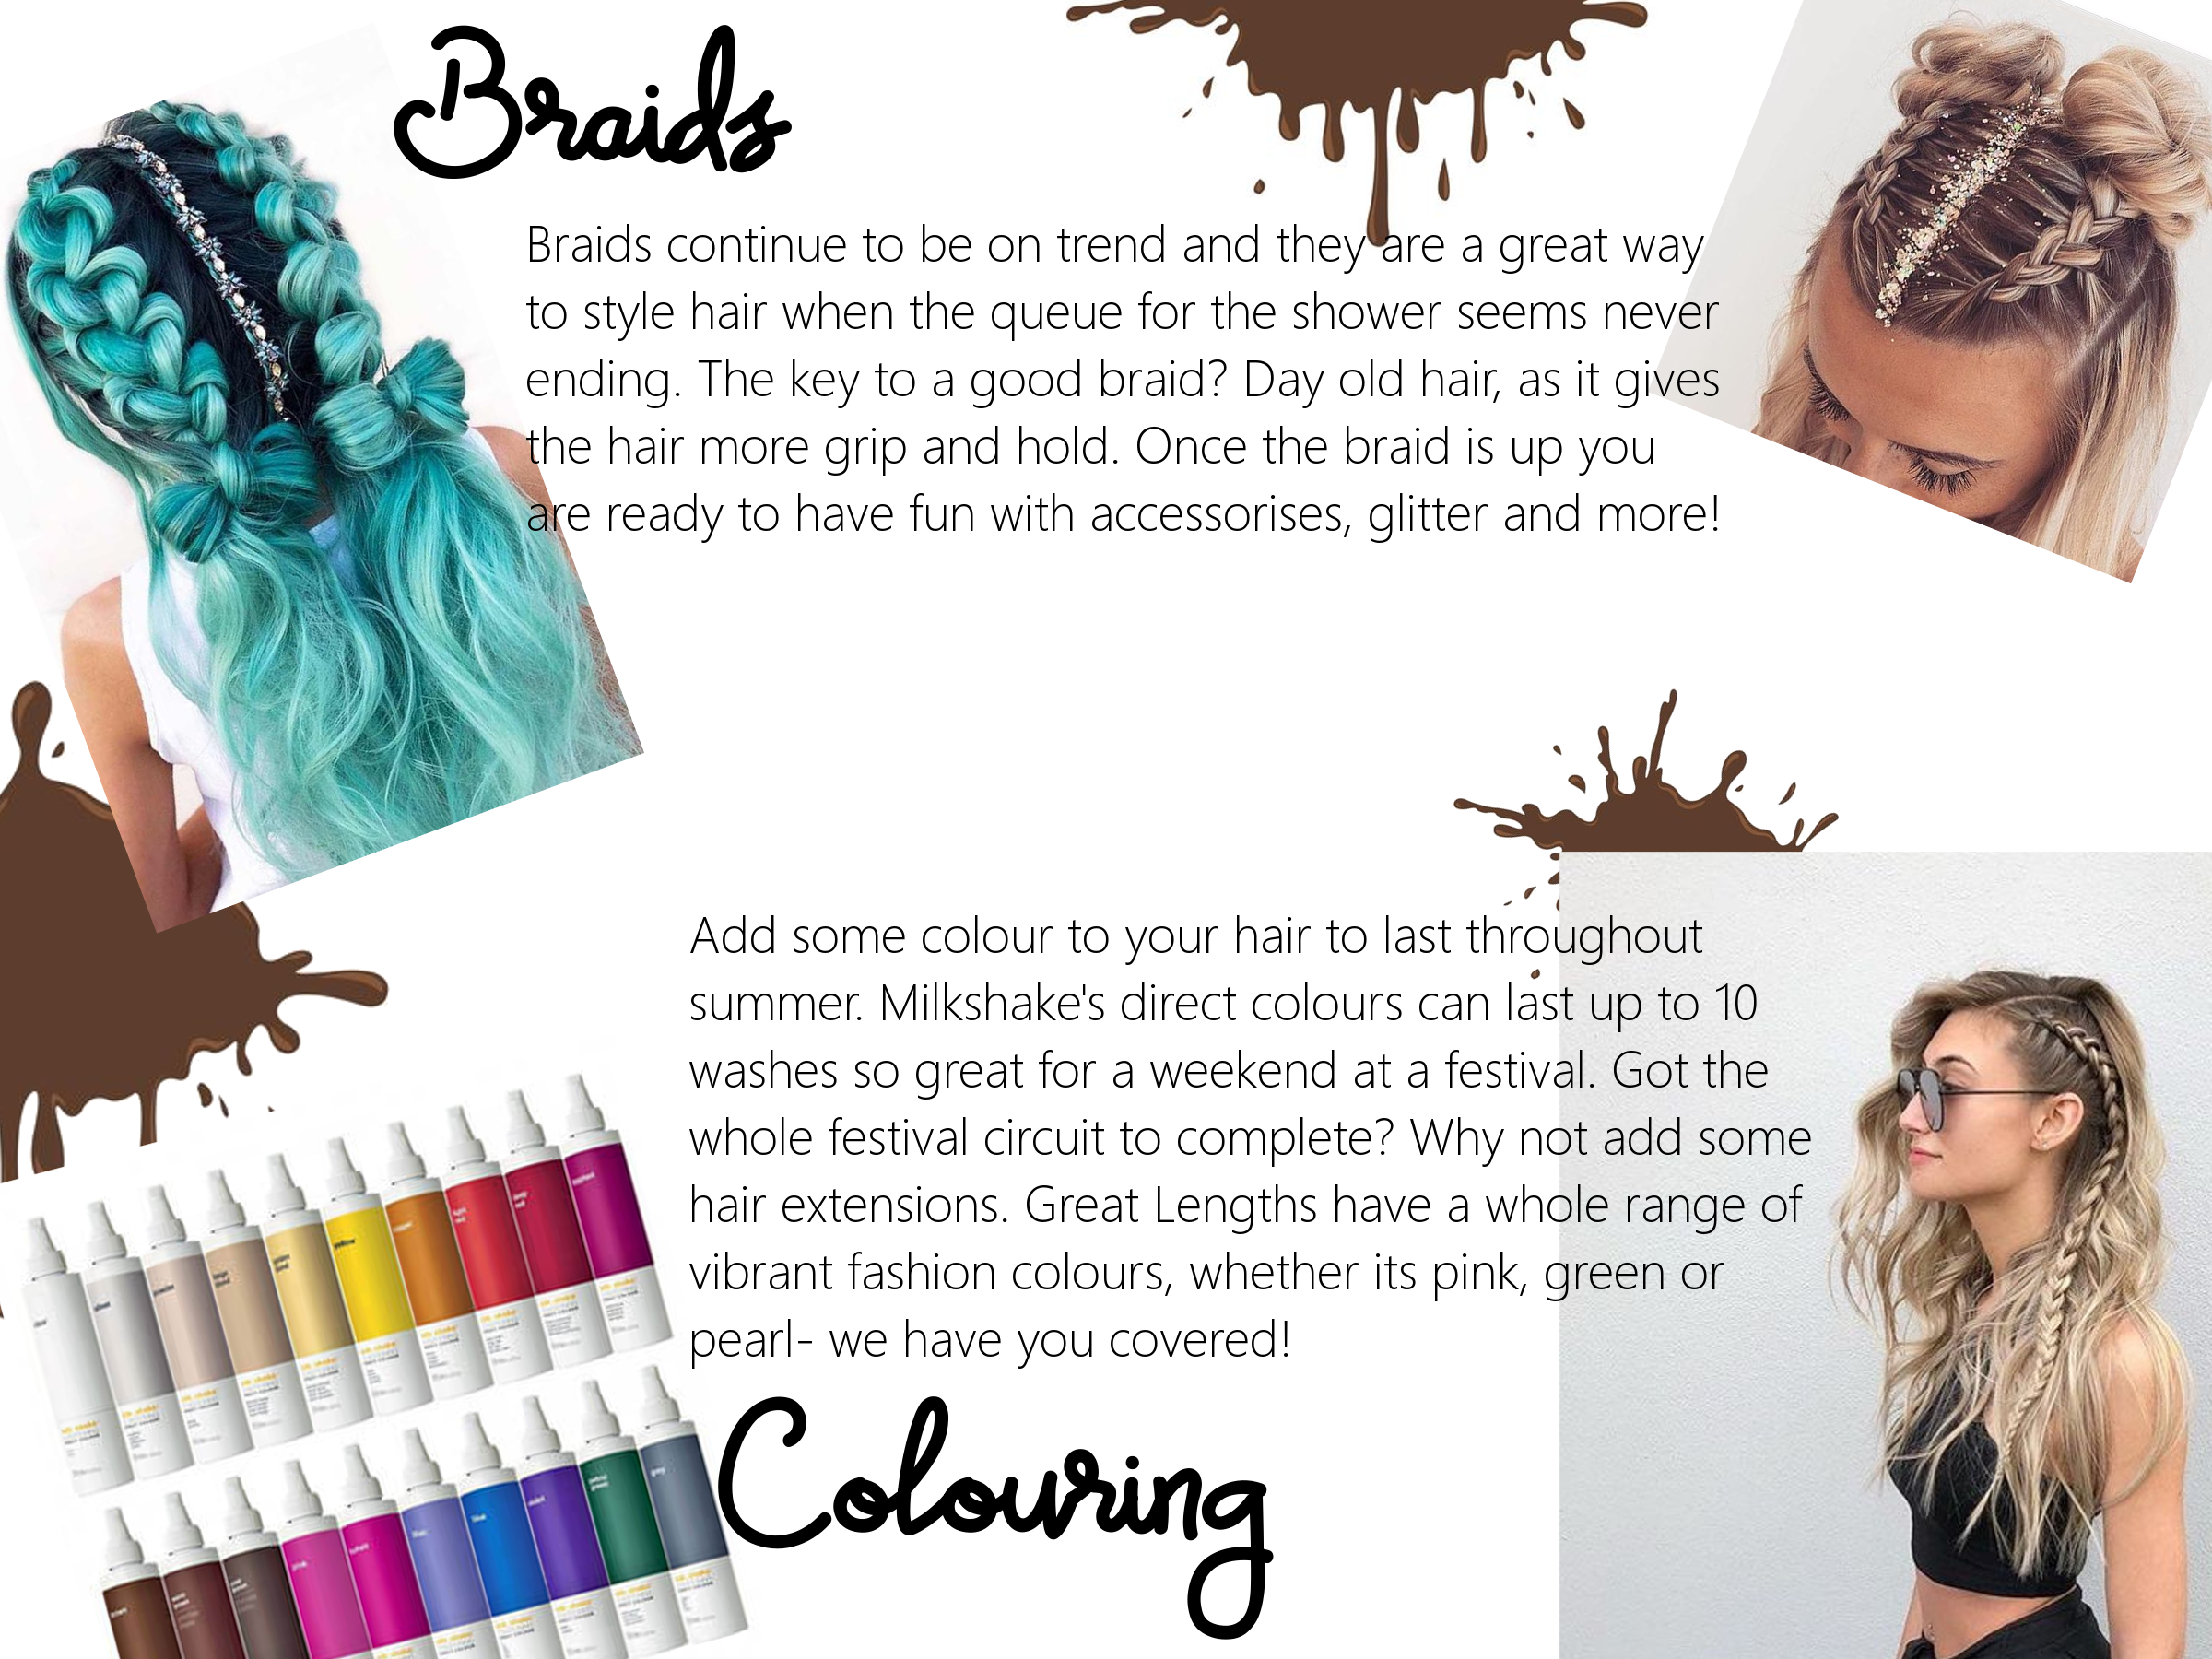 Venus-Beauty-Hair-Tavistock-Devon-Salon-Hairstylists-Festival-Summer-Braids-Colours-Milkshake-Direct-Great-Lengths-Hair-Extensions.png